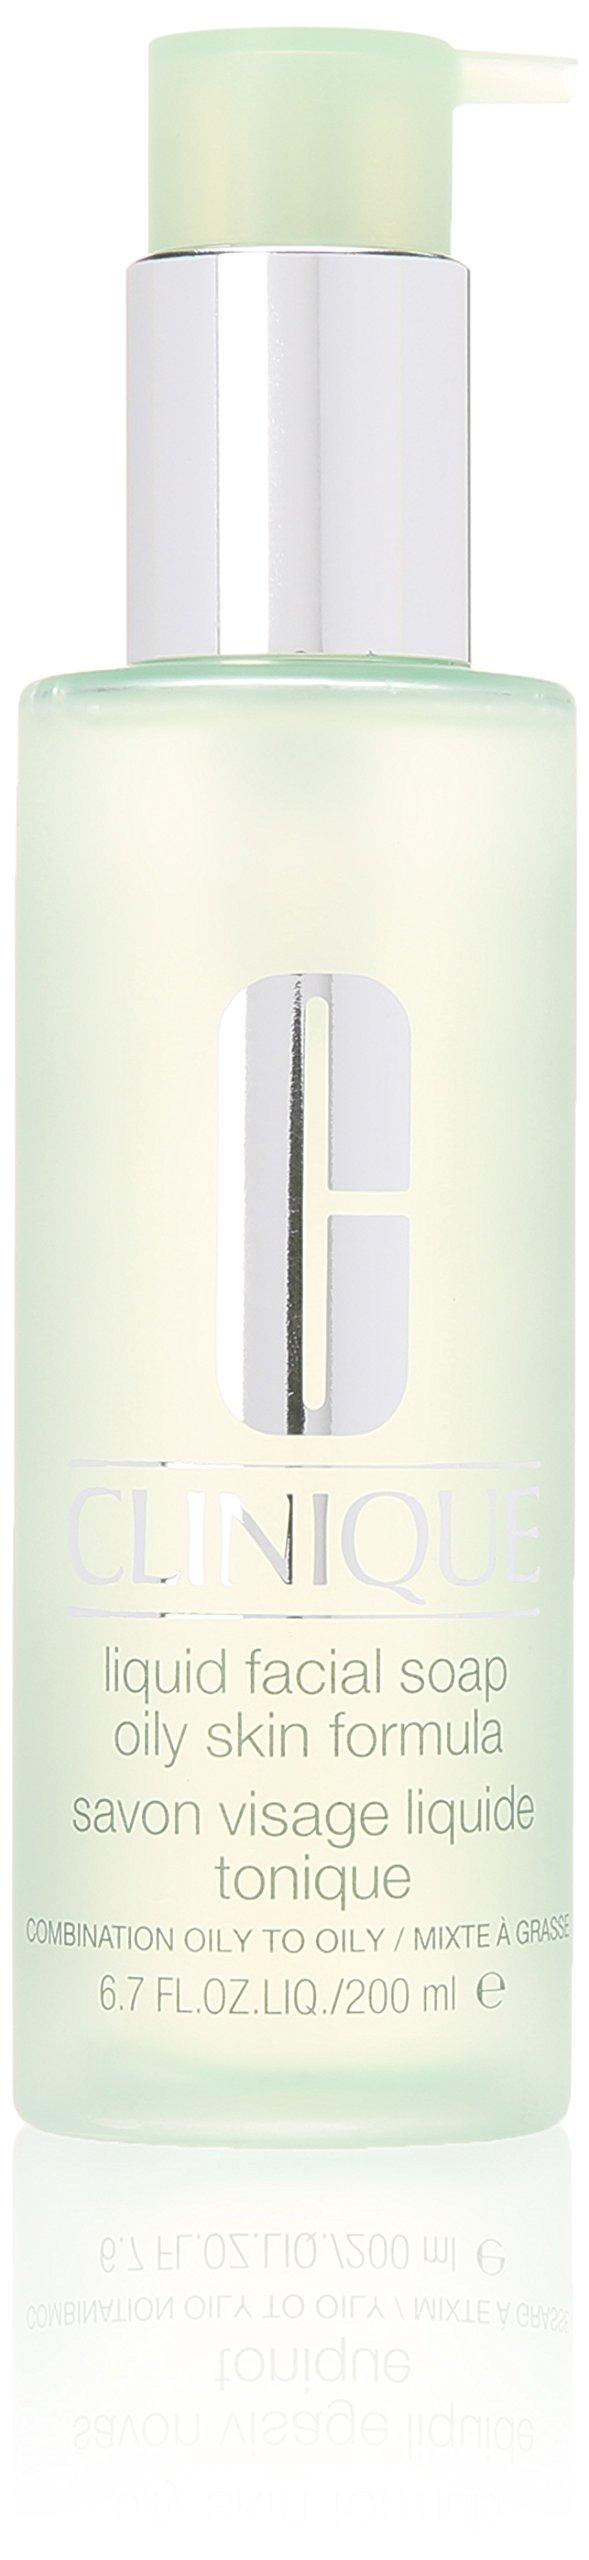 Clinique Liquid Facial Soap Oily Skin Formular 6F39 for Unisex, 6.7 Ounce